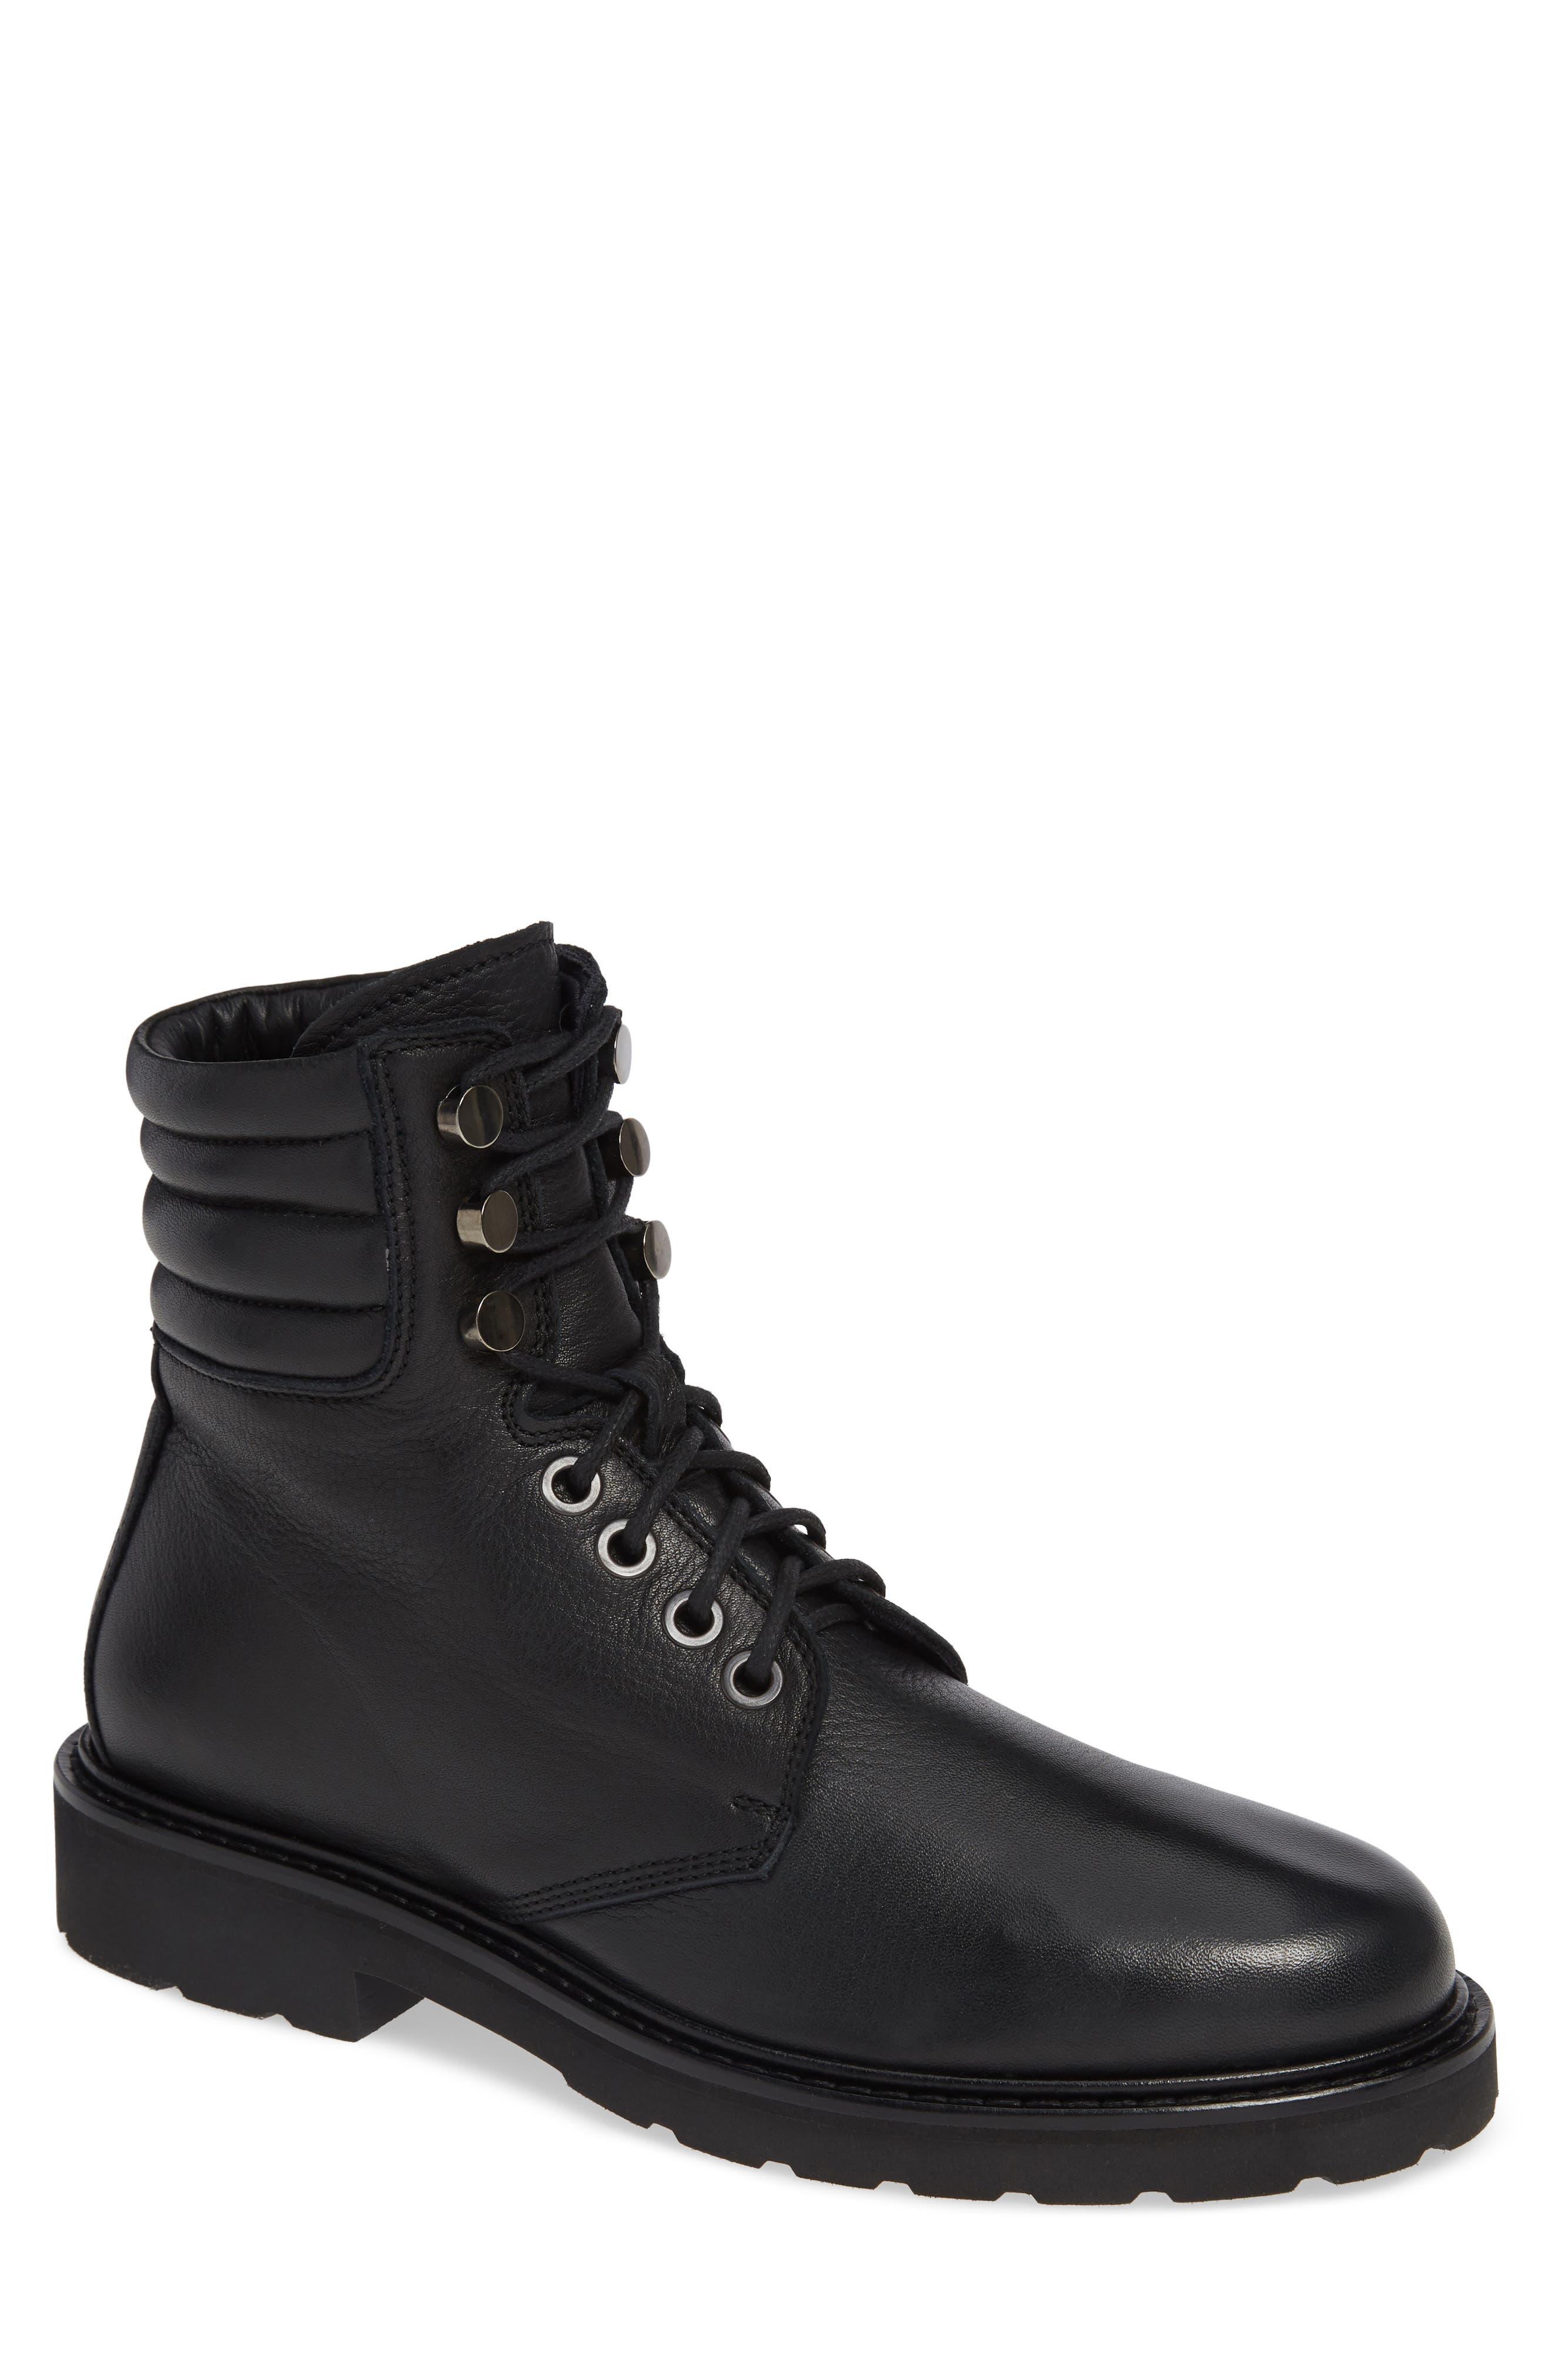 Aquatalia Heath Water Resistant Plain Toe Waterproof Boot- Black